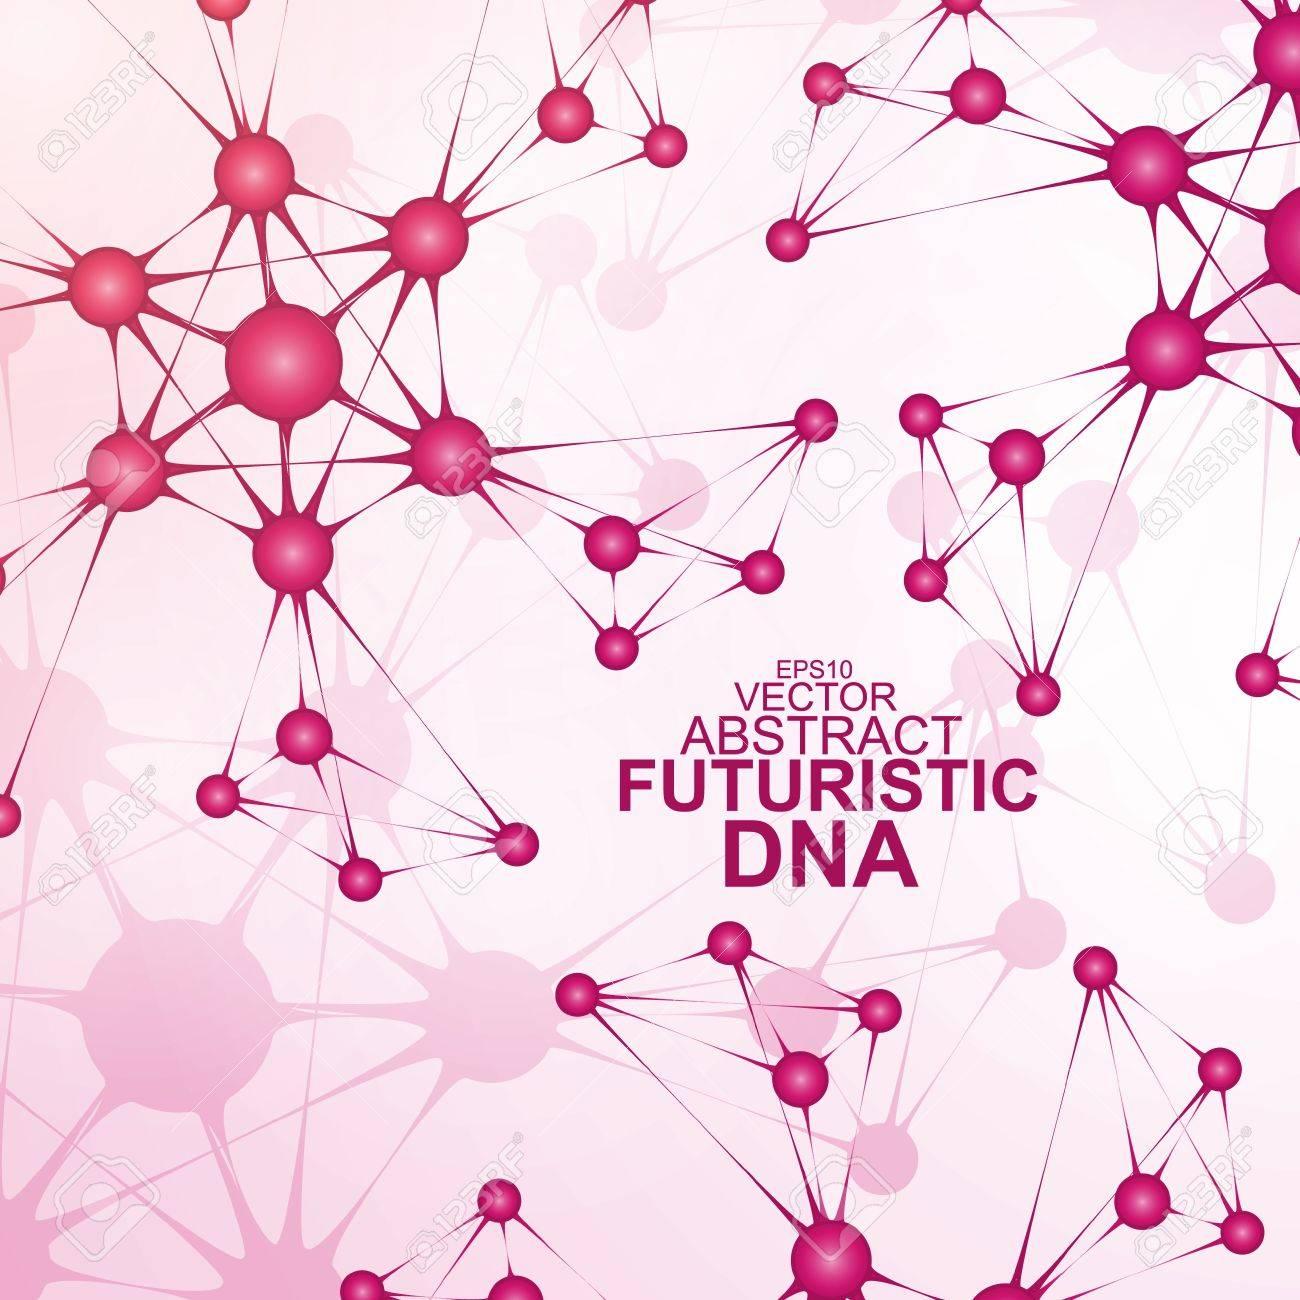 Futuristic dna, abstract molecule, cell illustration Stock Vector - 20725351